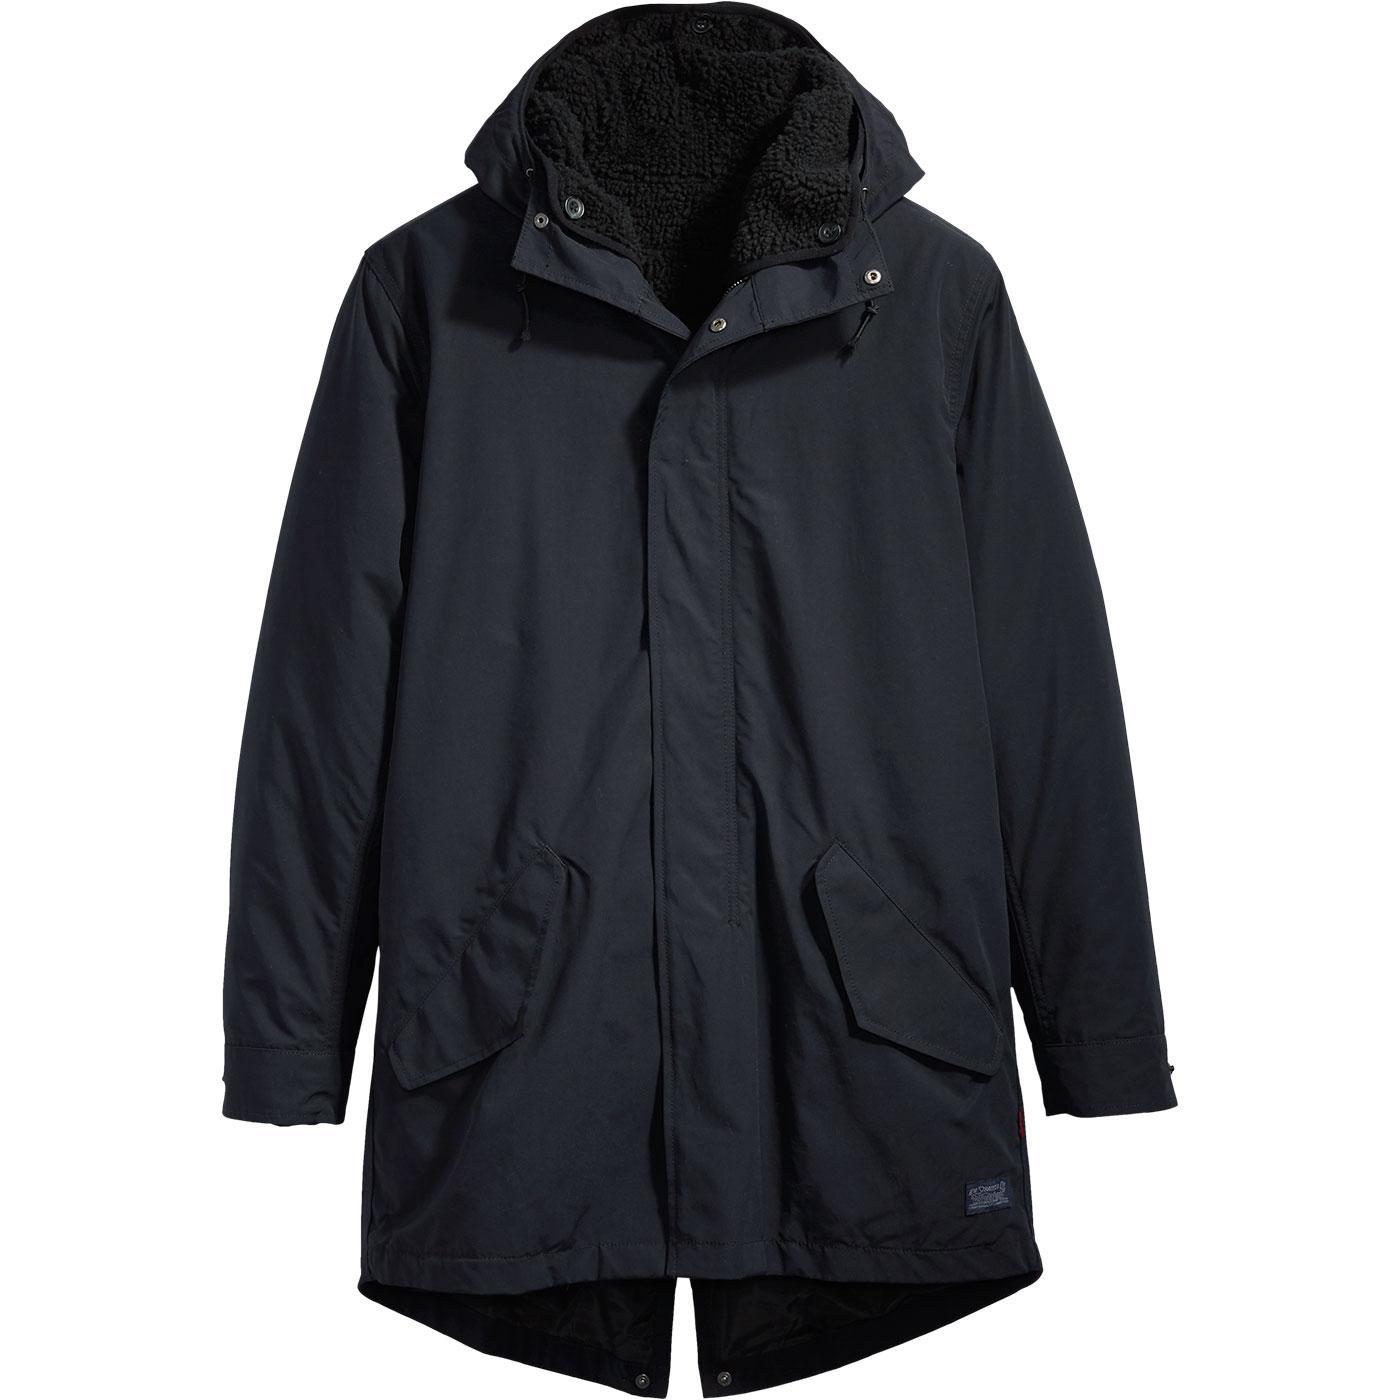 LEVI'S Mens Mod 3 in 1 Fishtail Parka Jacket BLACK